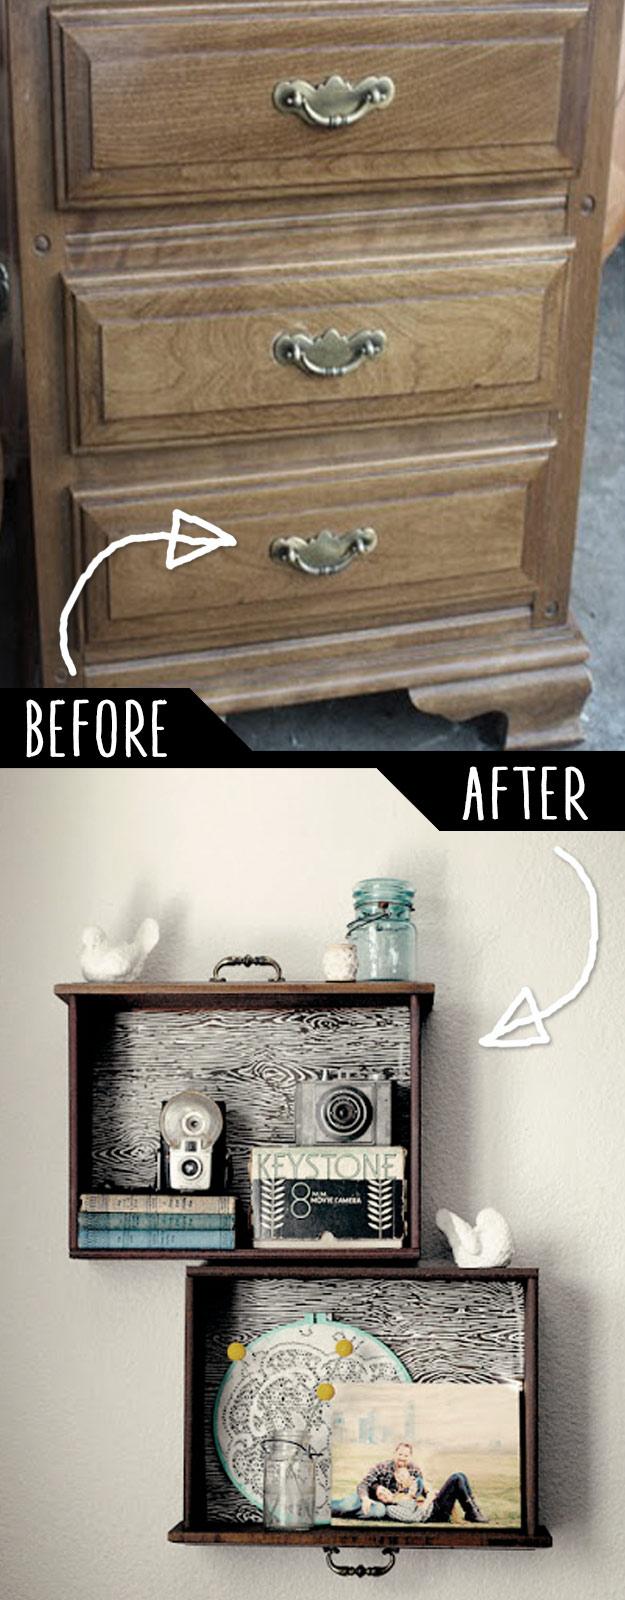 DIY Furniture Hacks | DIY Drawer Shelves | Cool Ideas for Creative Do It Yourself Furniture | Cheap Home Decor Ideas for Bedroom, Bathroom, Living Room, Kitchen #diy